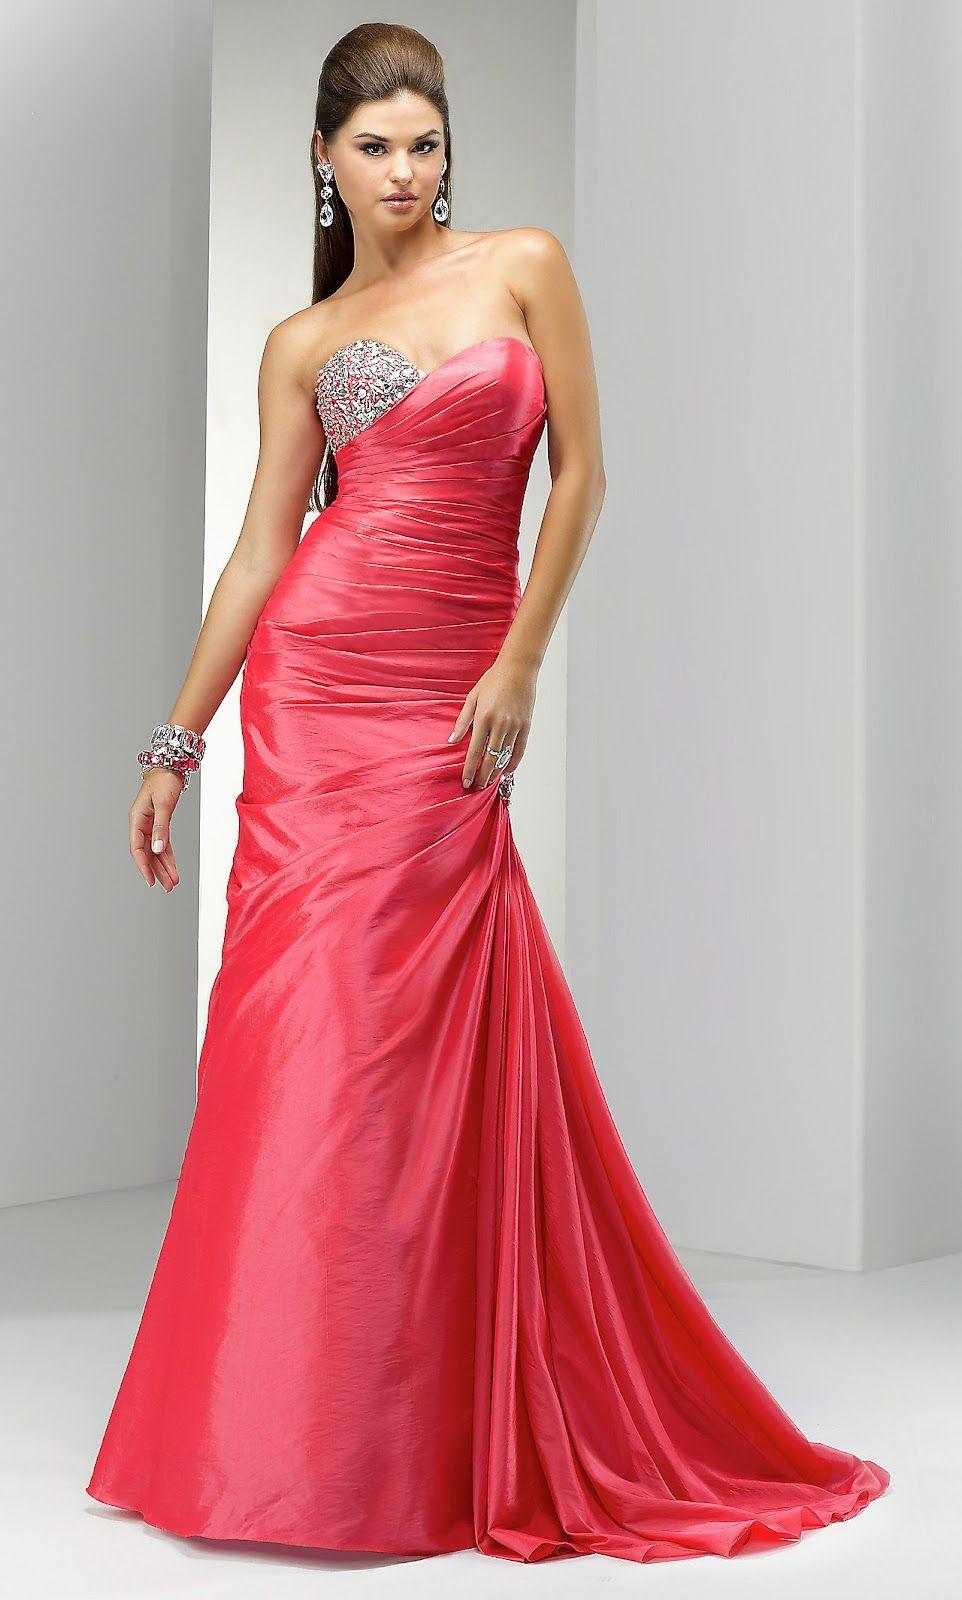 Beautiful Long Dresses Photo Album - Reikian